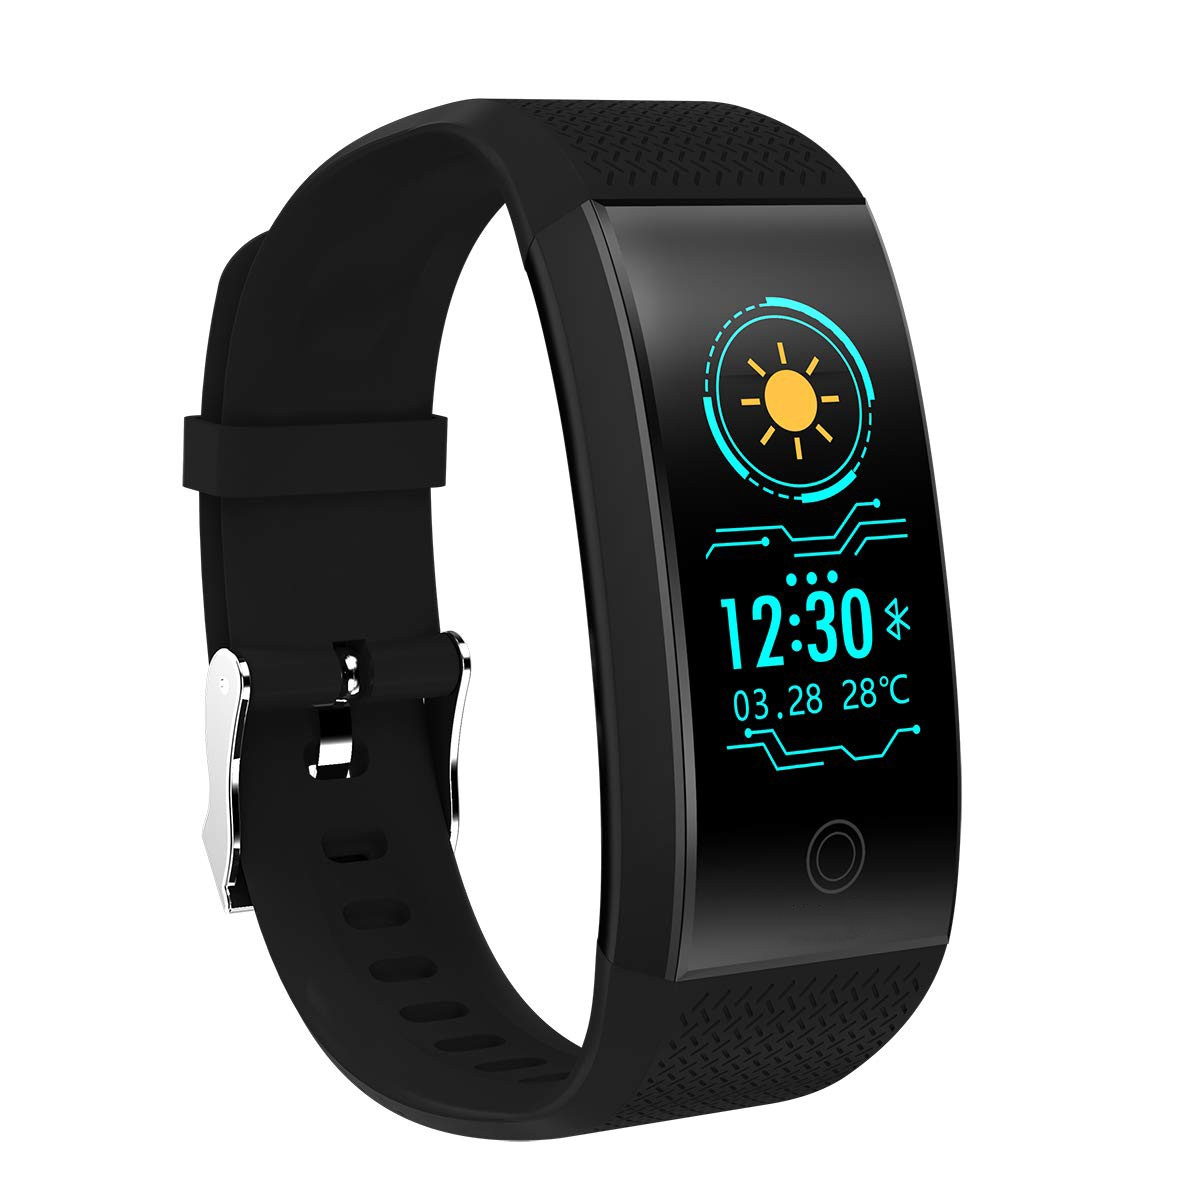 Bratara Fitness Smart Techstar® QW18 NEGRU, Monitorizare Cardiaca, Sedentary, Bluetooth, IP65, Ecran IPS